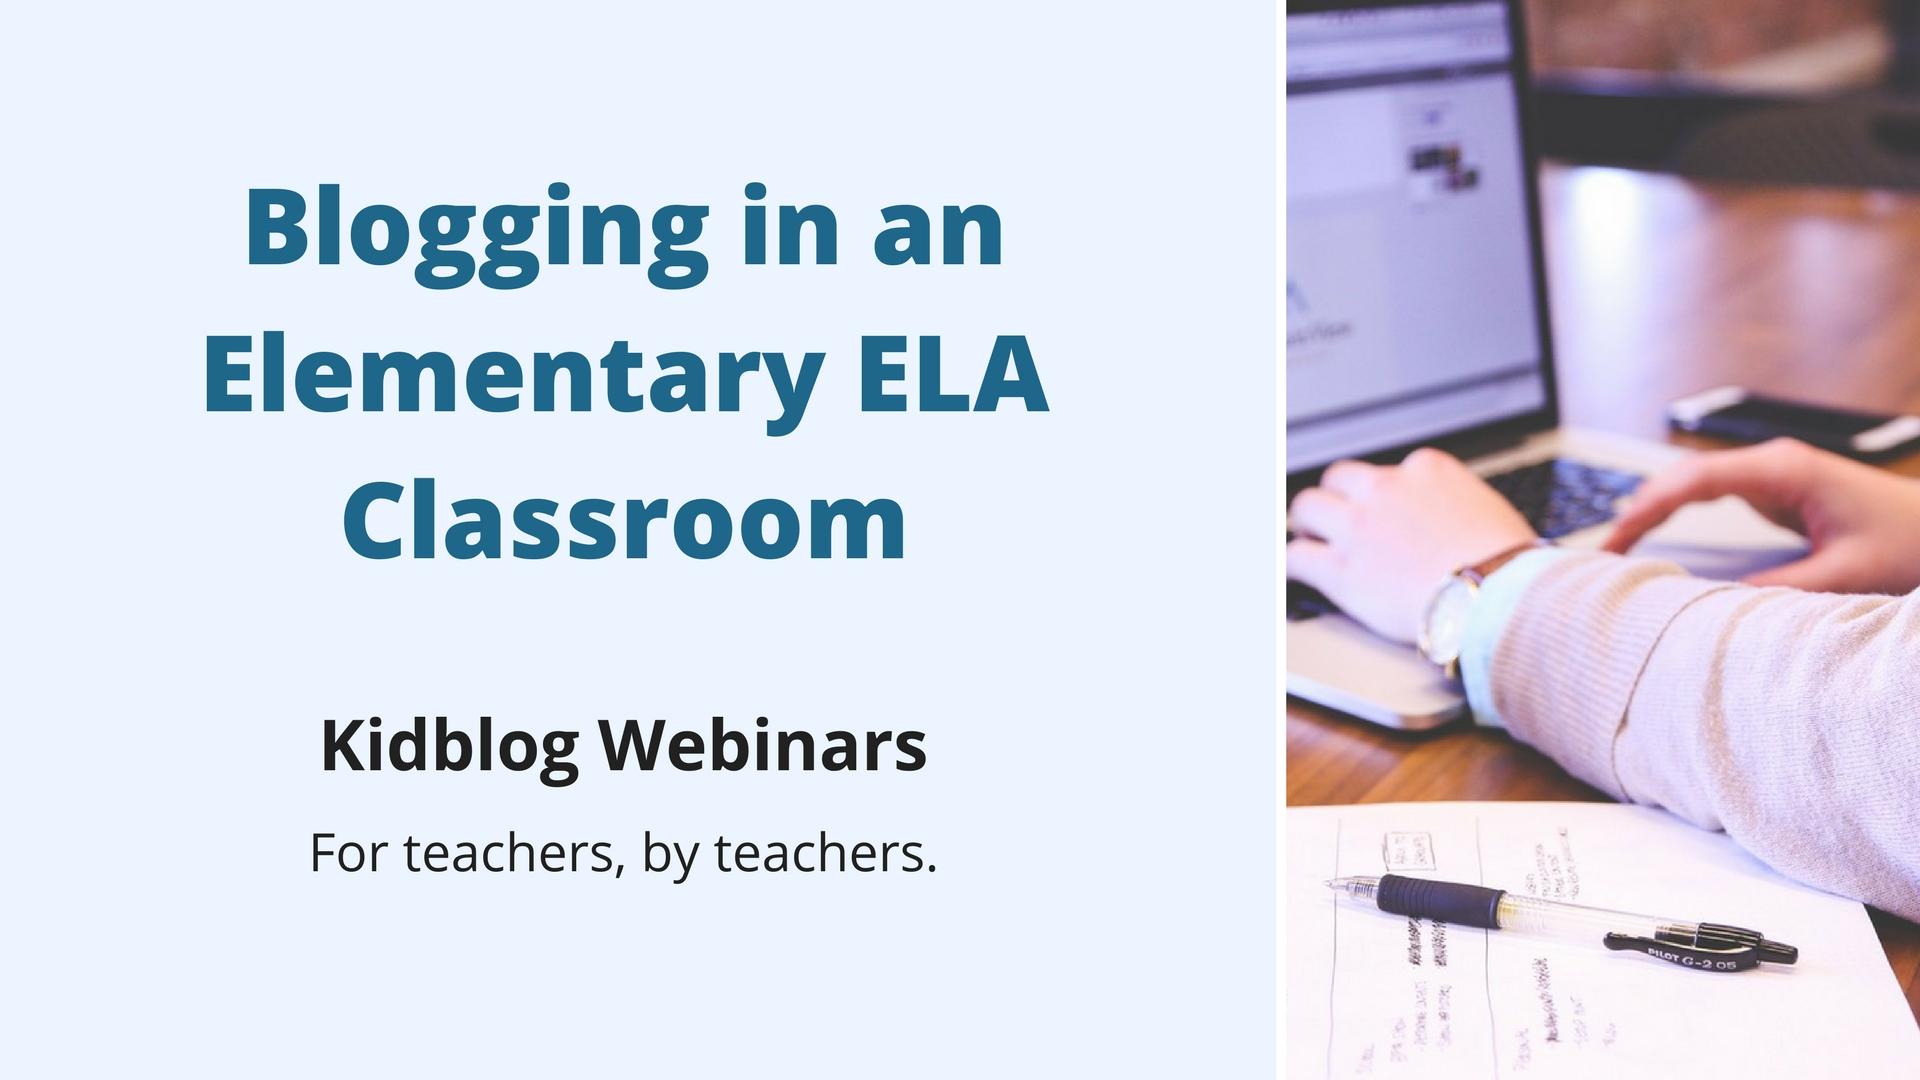 Webinar: Blogging in an Elementary ELA Classroom